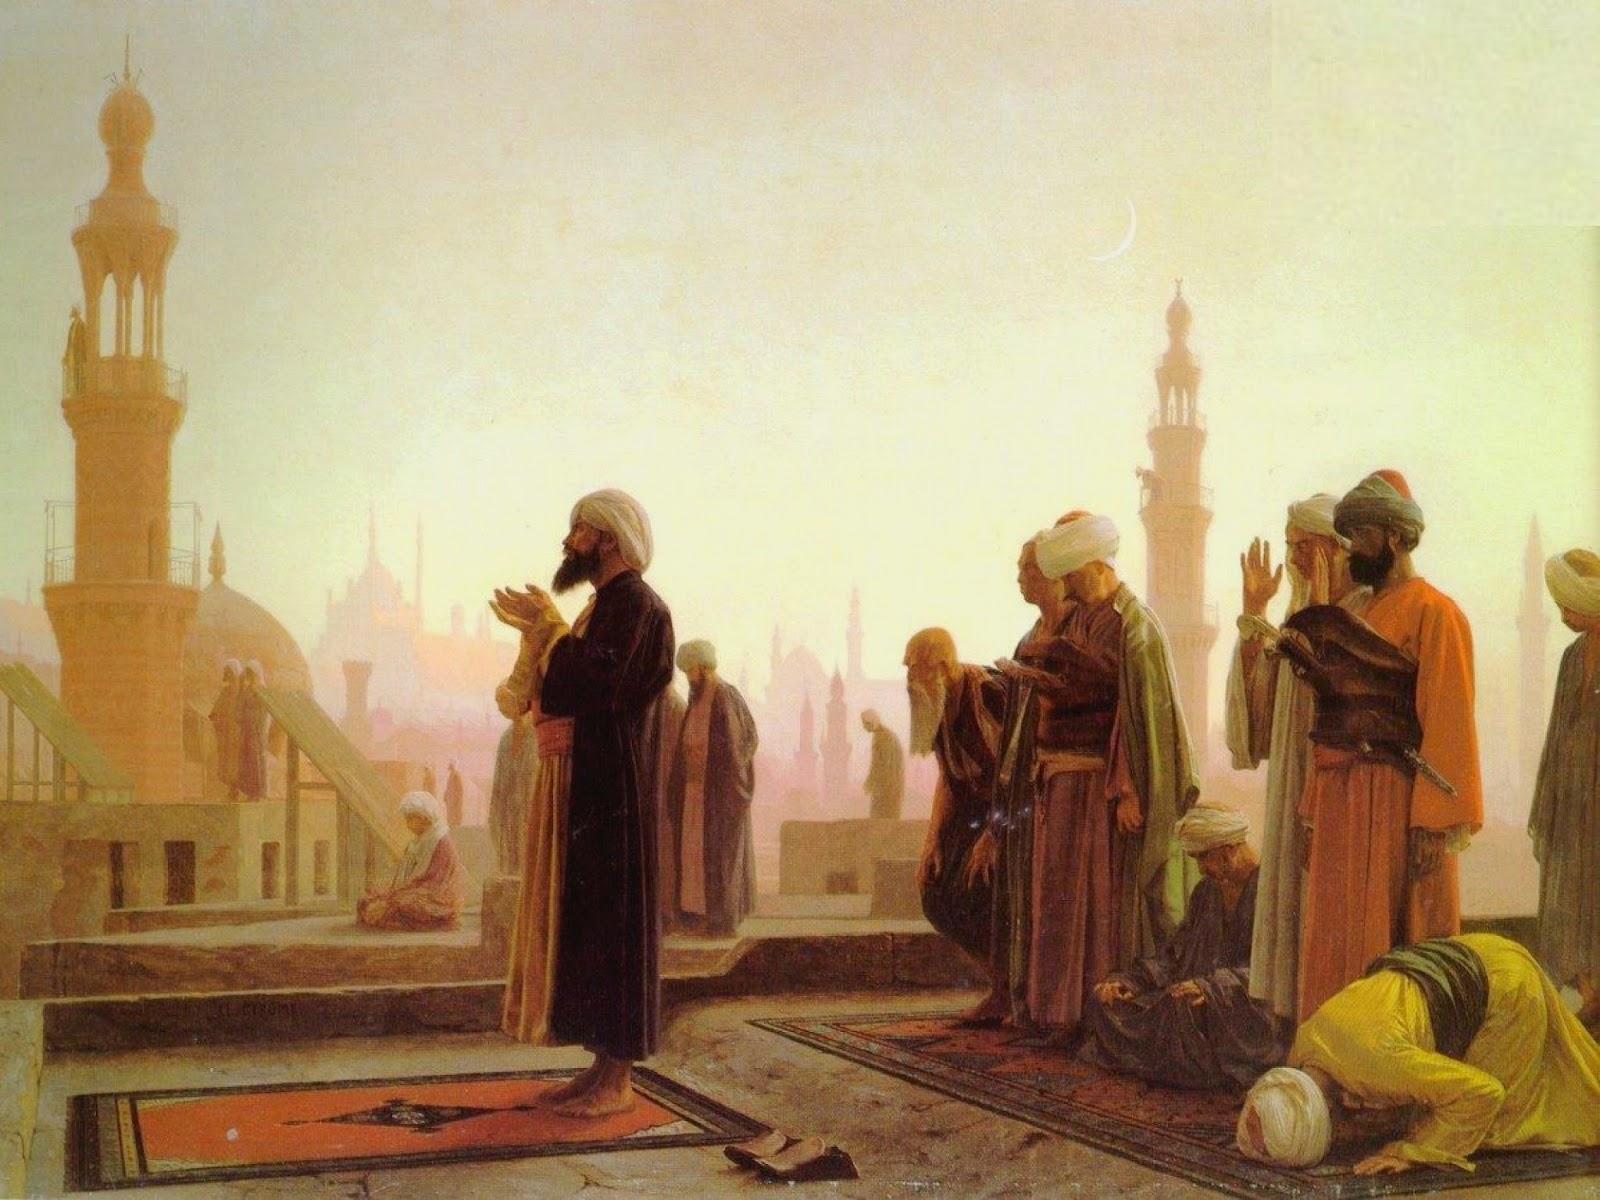 painting-old-times-muslims-praying.jpg